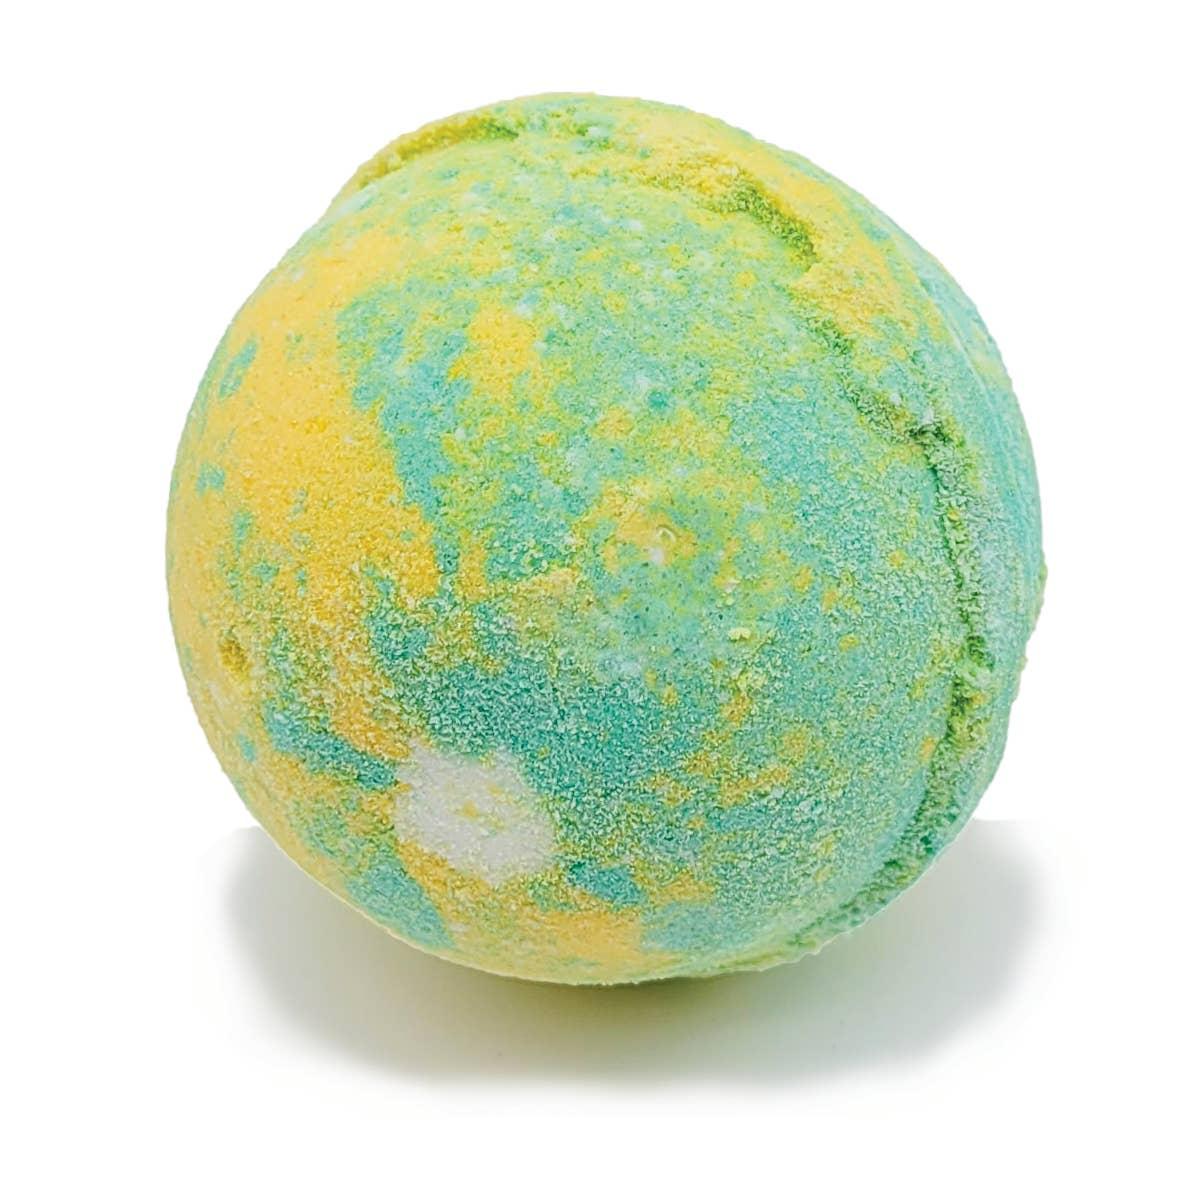 Evolve - Bath Bomb - Yuzu Blossom | Trada Marketplace